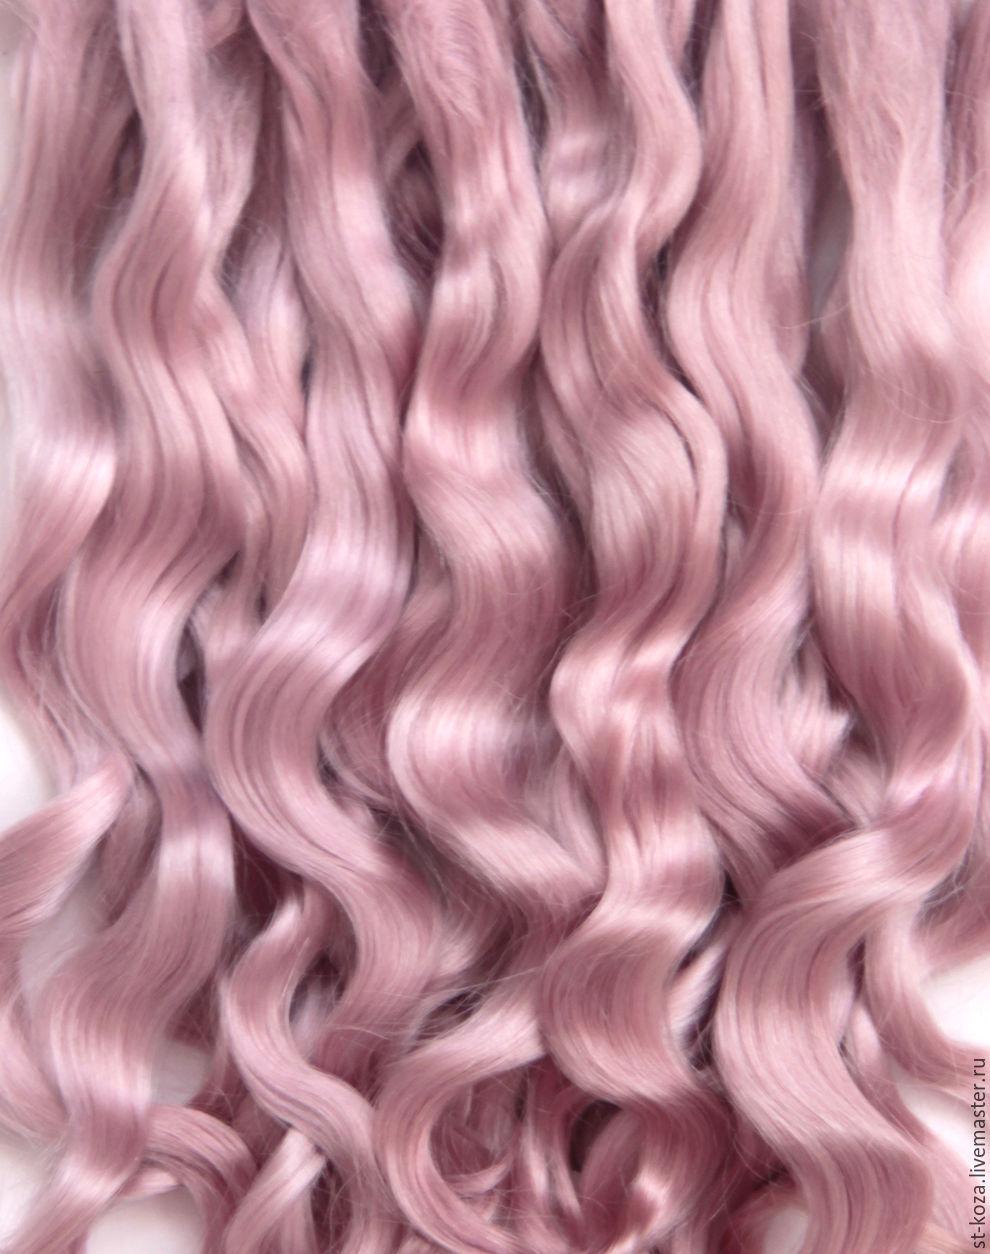 Кудри розовый блонд, Сувениры, Оренбург, Фото №1